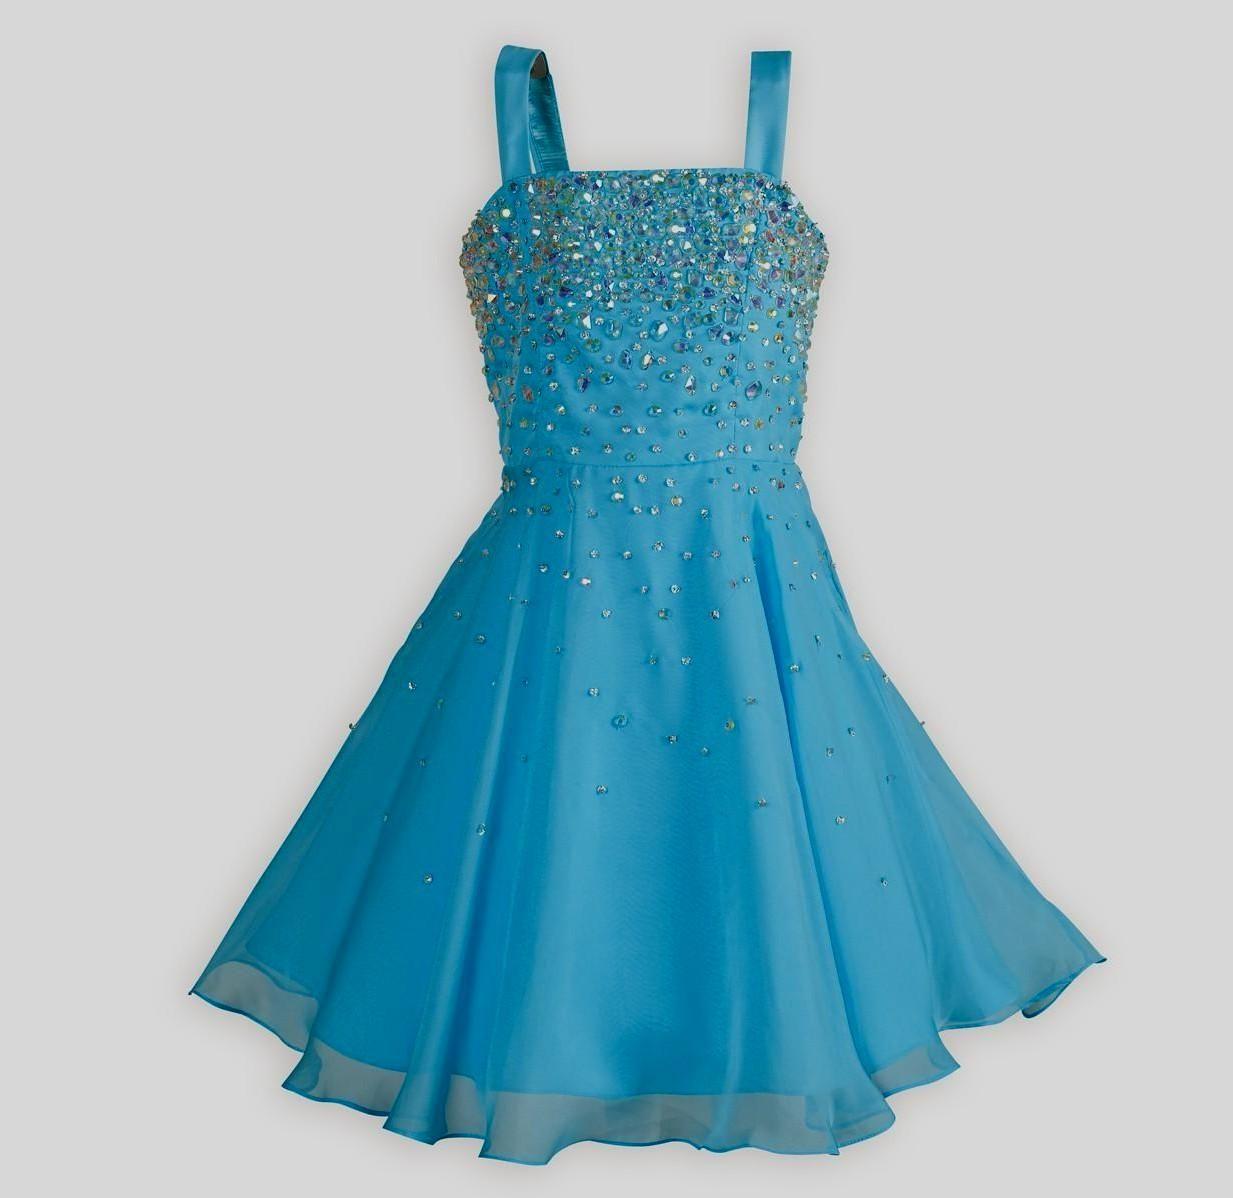 Image result for dresses for tweens for a school dance | Girls ...